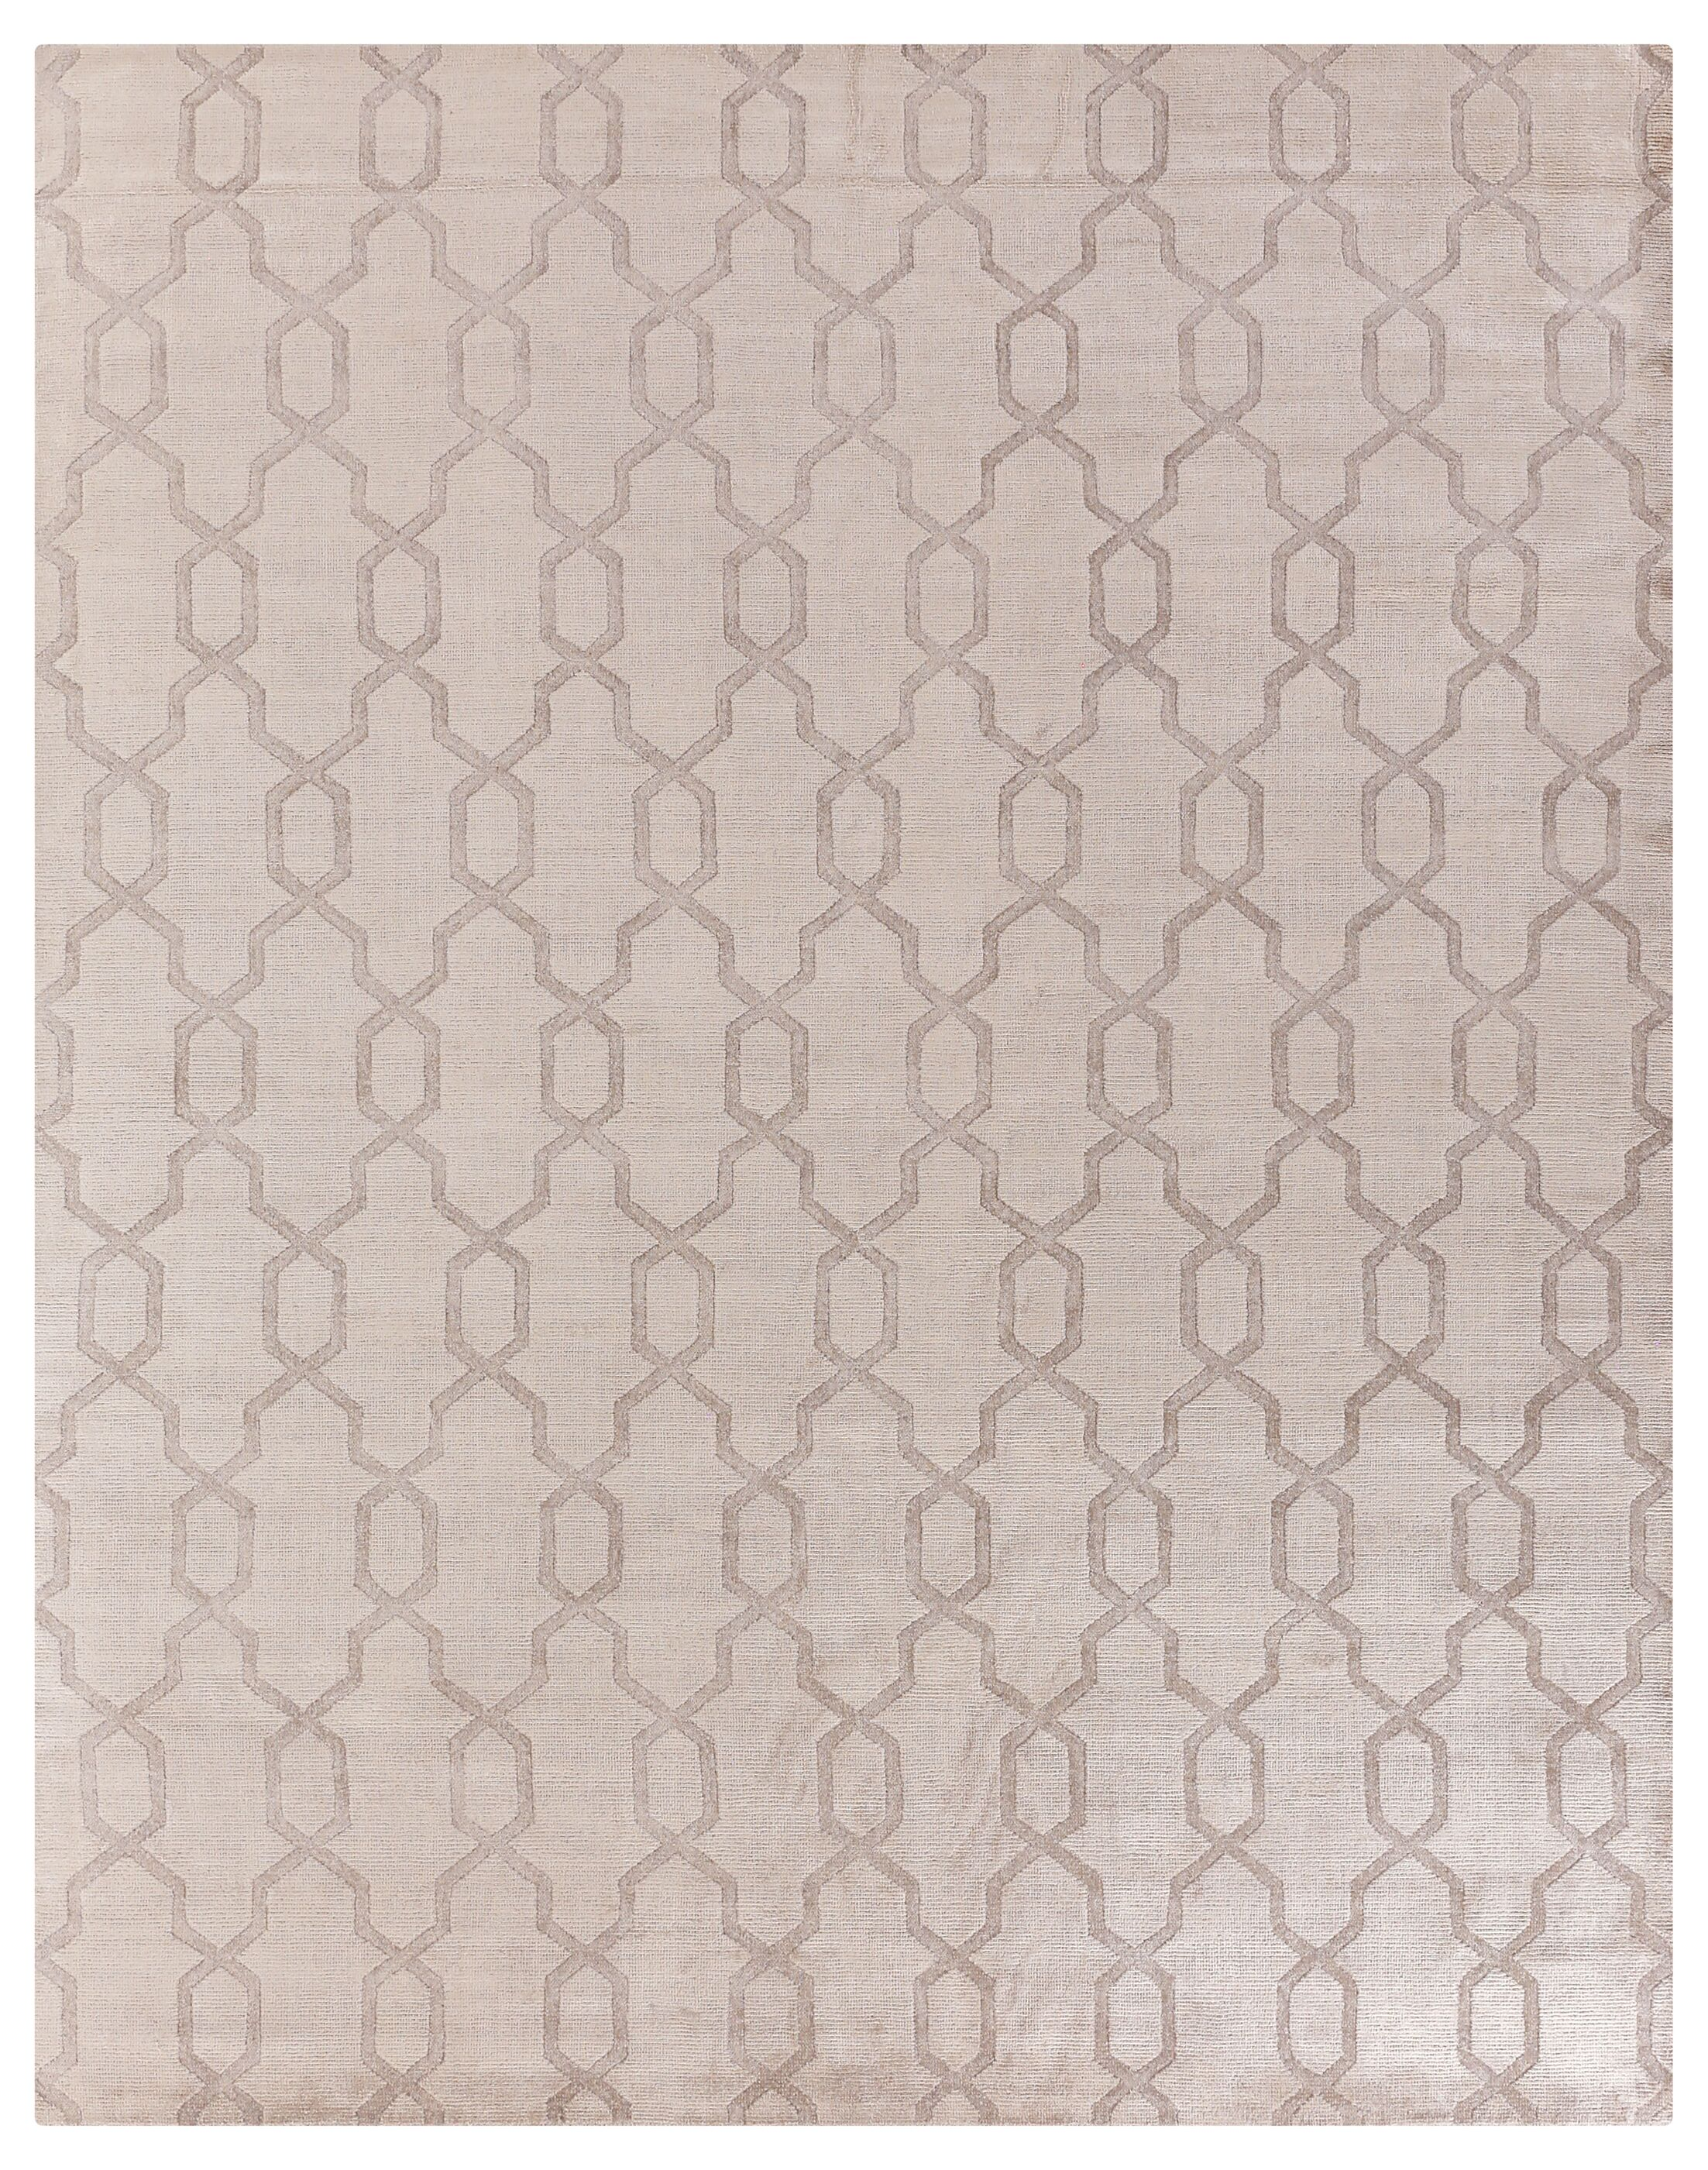 Samara Hand-Woven Gray Area Rug Rug Size: Rectangle 10' x 14'